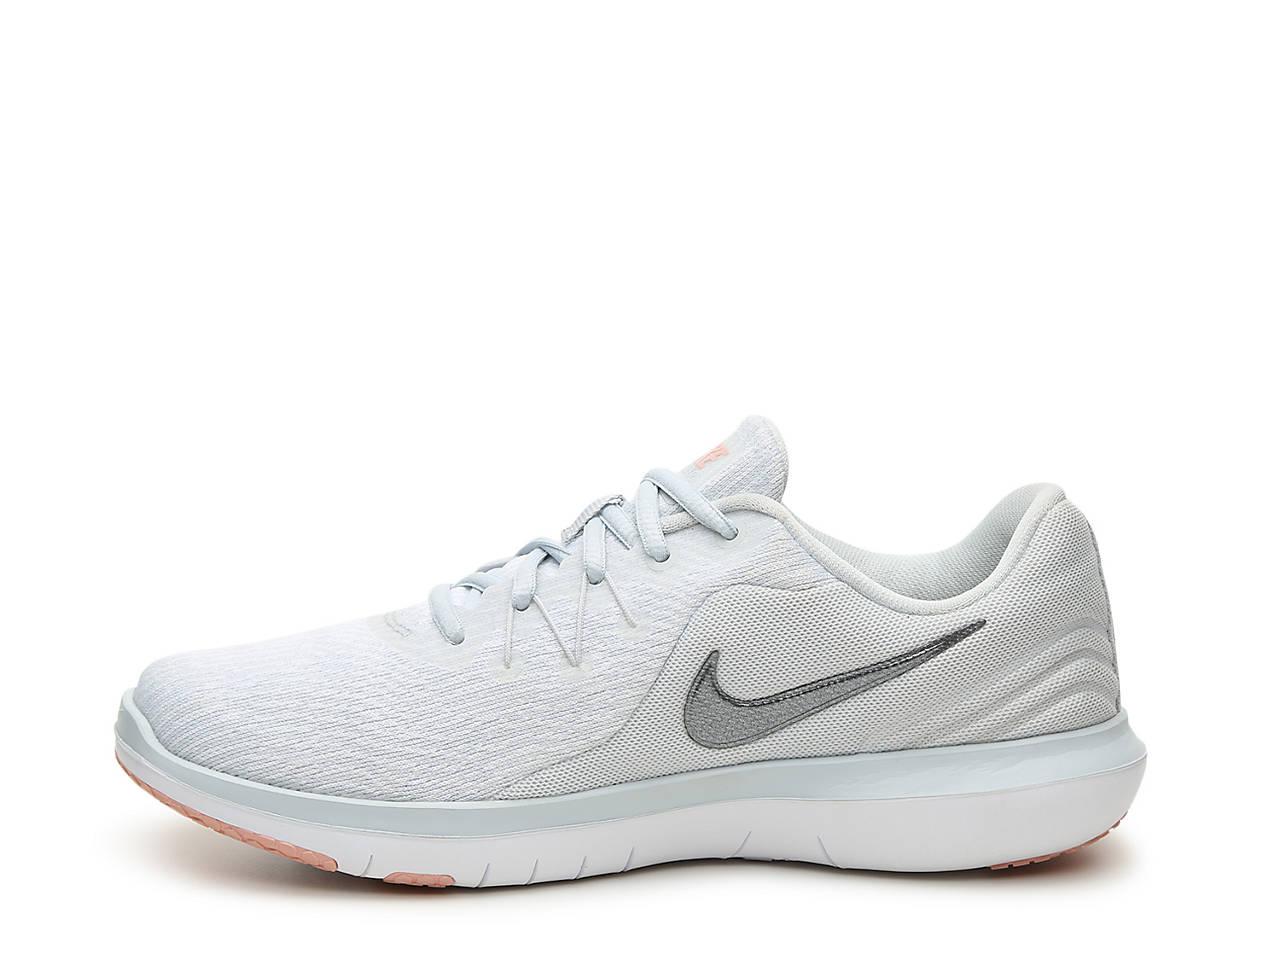 fd395642aeb7 Nike Flex Supreme 6 Lightweight Training Shoe - Women s Women s ...